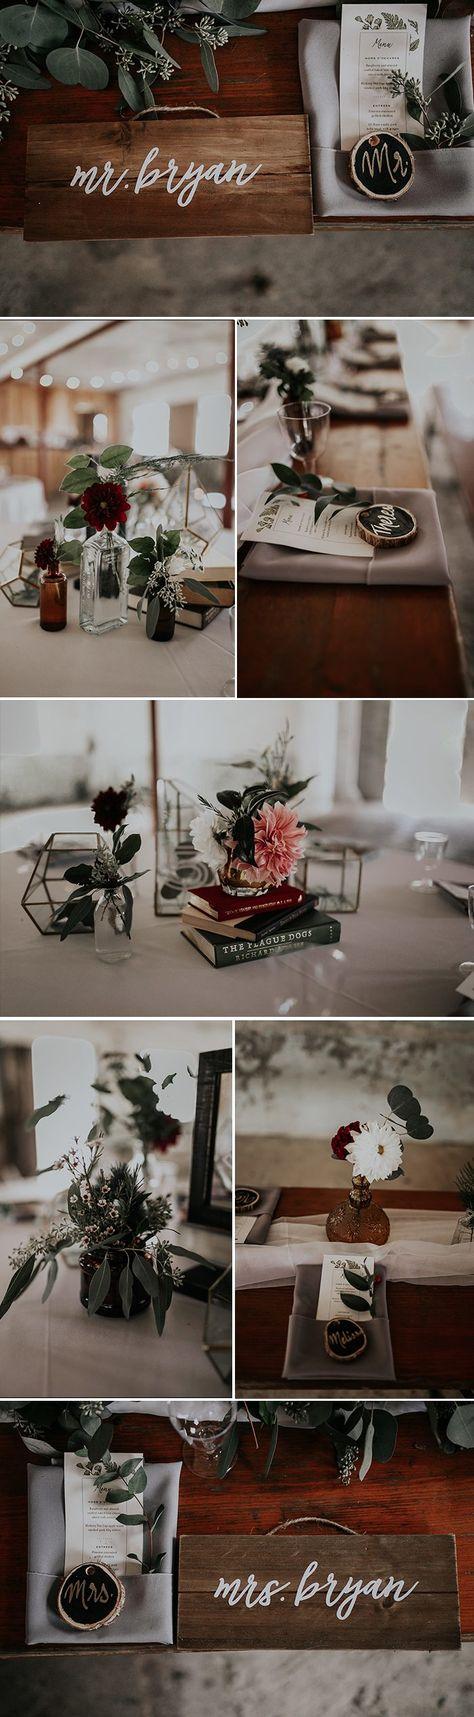 Minimalist + organic wedding reception table decor | Image by Fox and Owl Studio #weddingphotoinspiration #weddingphotoideas #reception #weddingreception #weddingreceptioninspo #receptioninspiration #receptiondecor #receptioninspo #finishingtouches #weddingdecor #tablescape #centerpieces